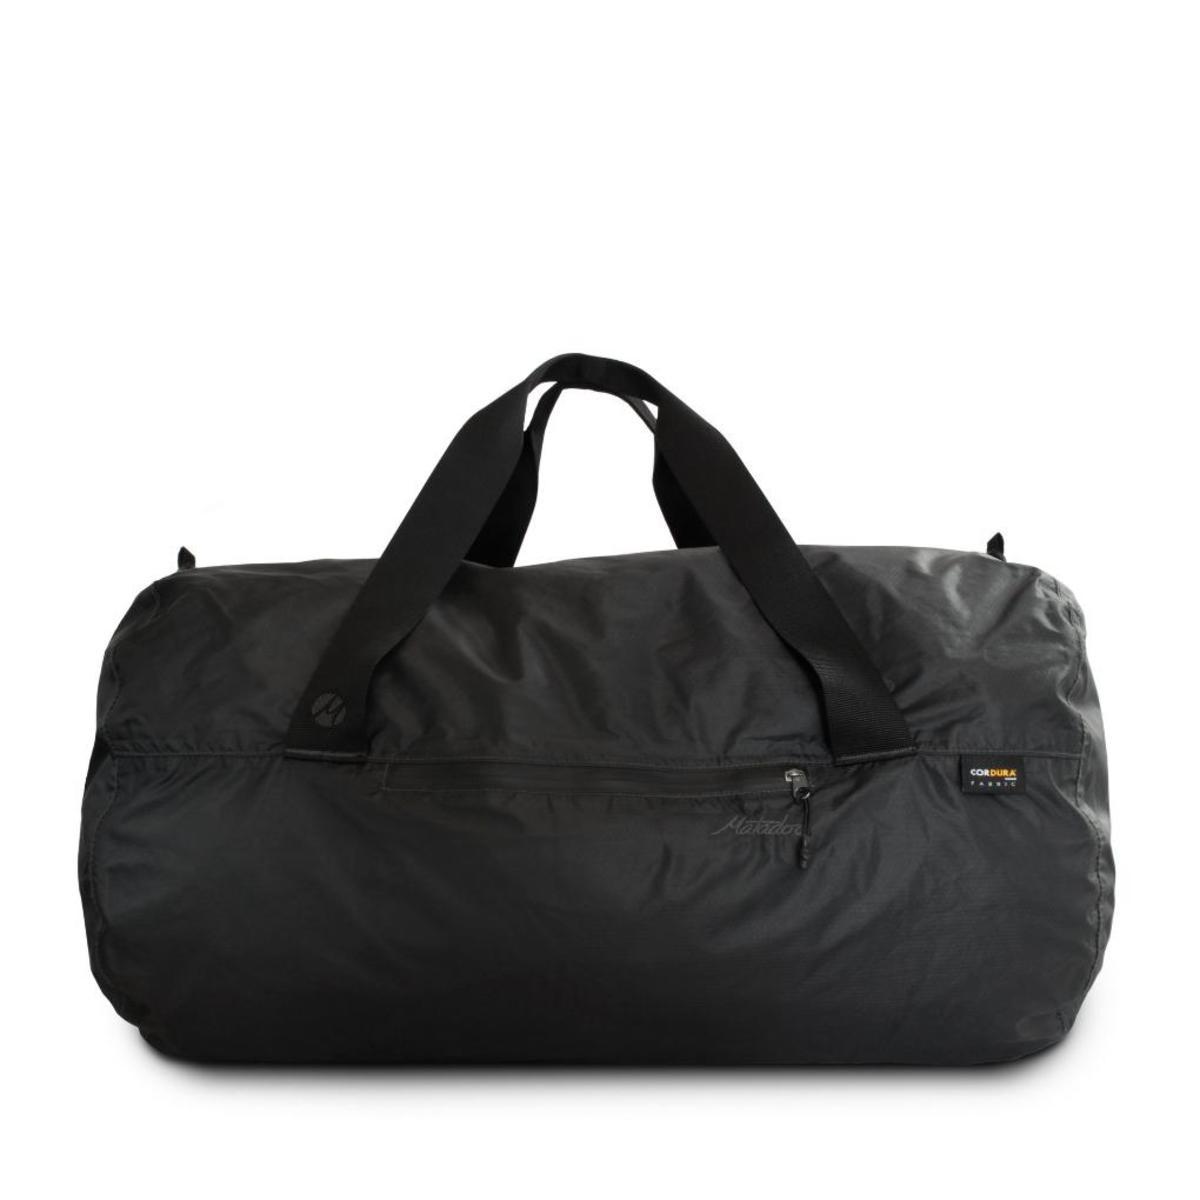 HK 2.0 TRANSIT DUFFLE30 30L Packable OutDoor Travel Fishing Biking Backpack Durable Waterproof